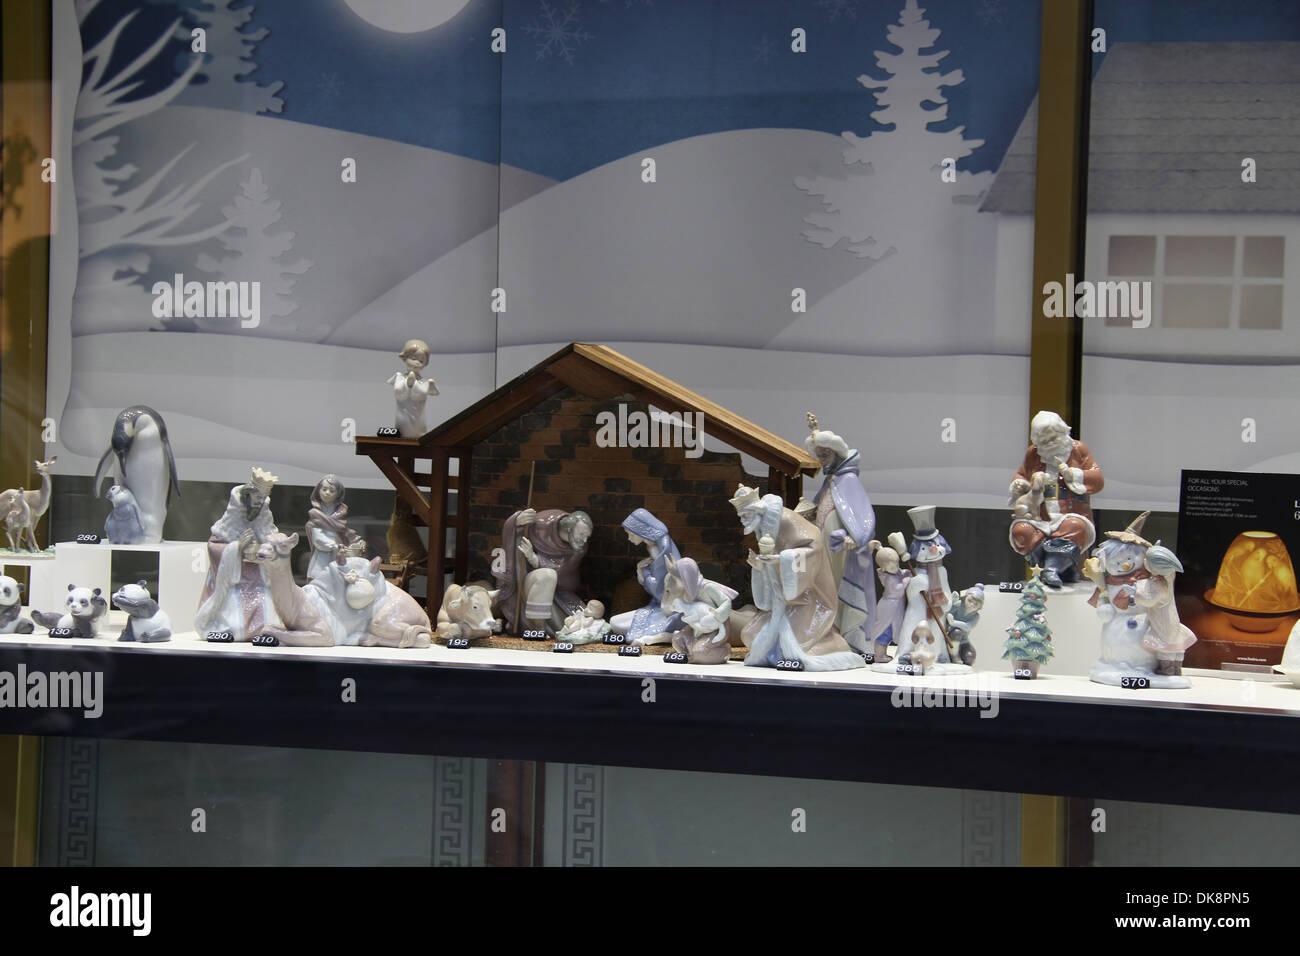 China Nativity Figures in a Dublin Shop Window Stock Photo